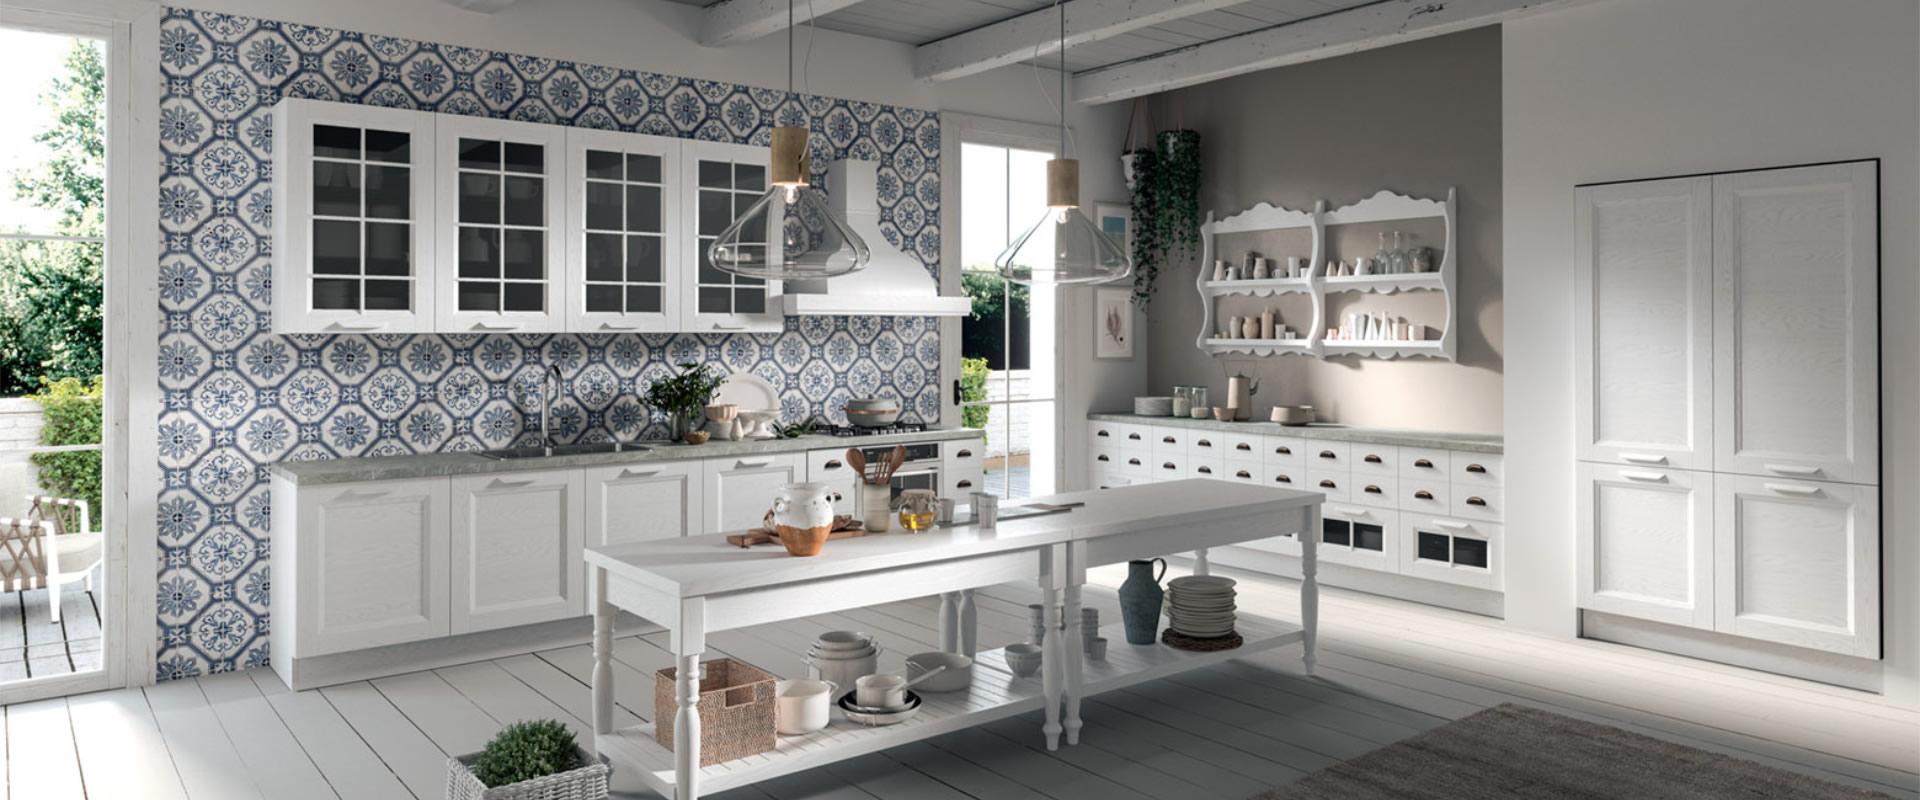 Cucina ylenia cesena aran cucine - Aran cucine ylenia ...